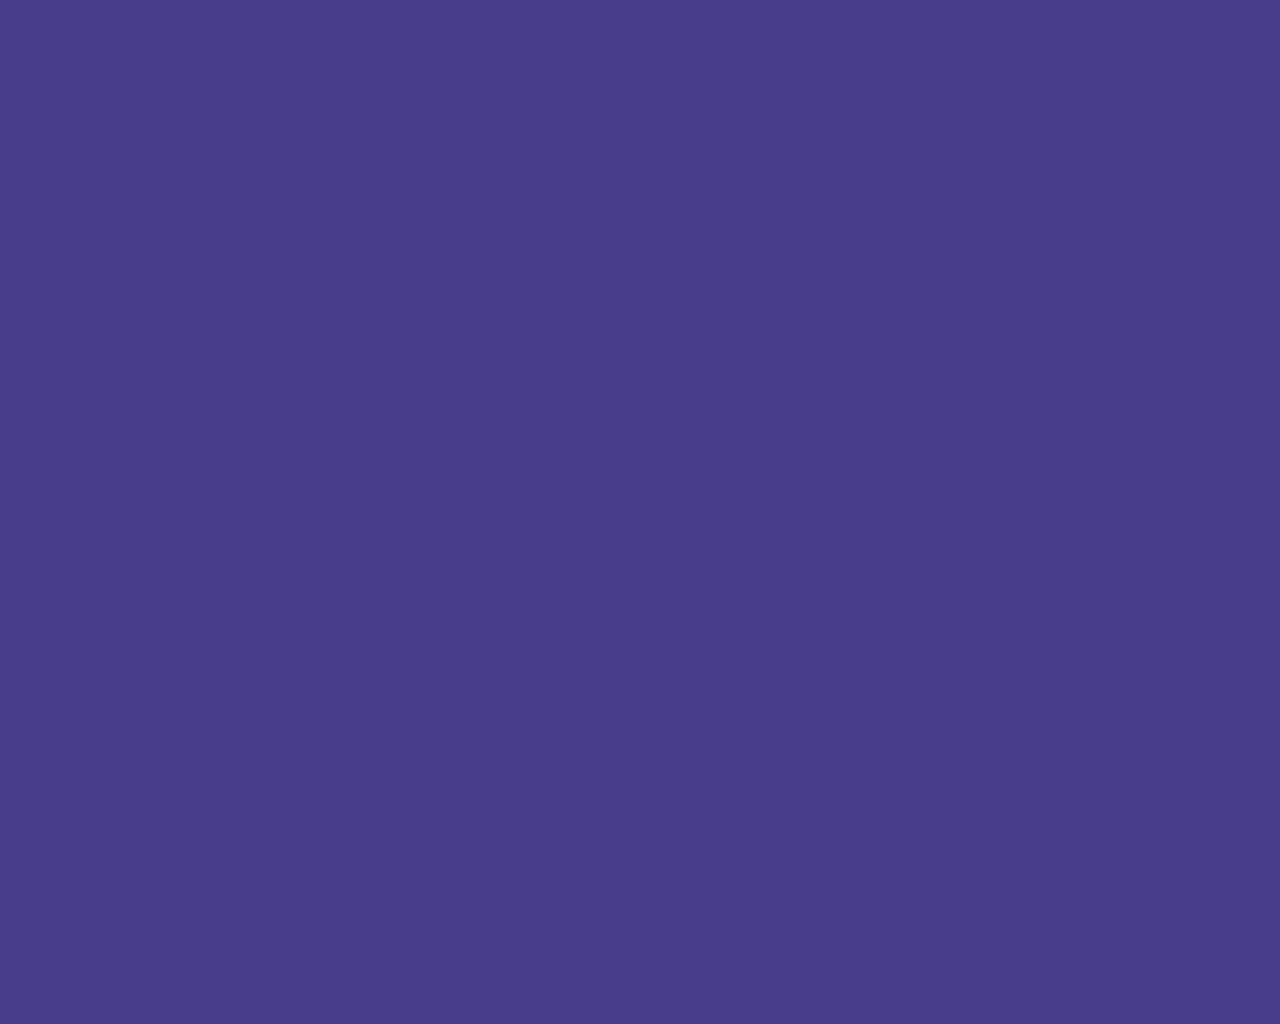 1280x1024 dark slate blue solid color background for The color slate blue